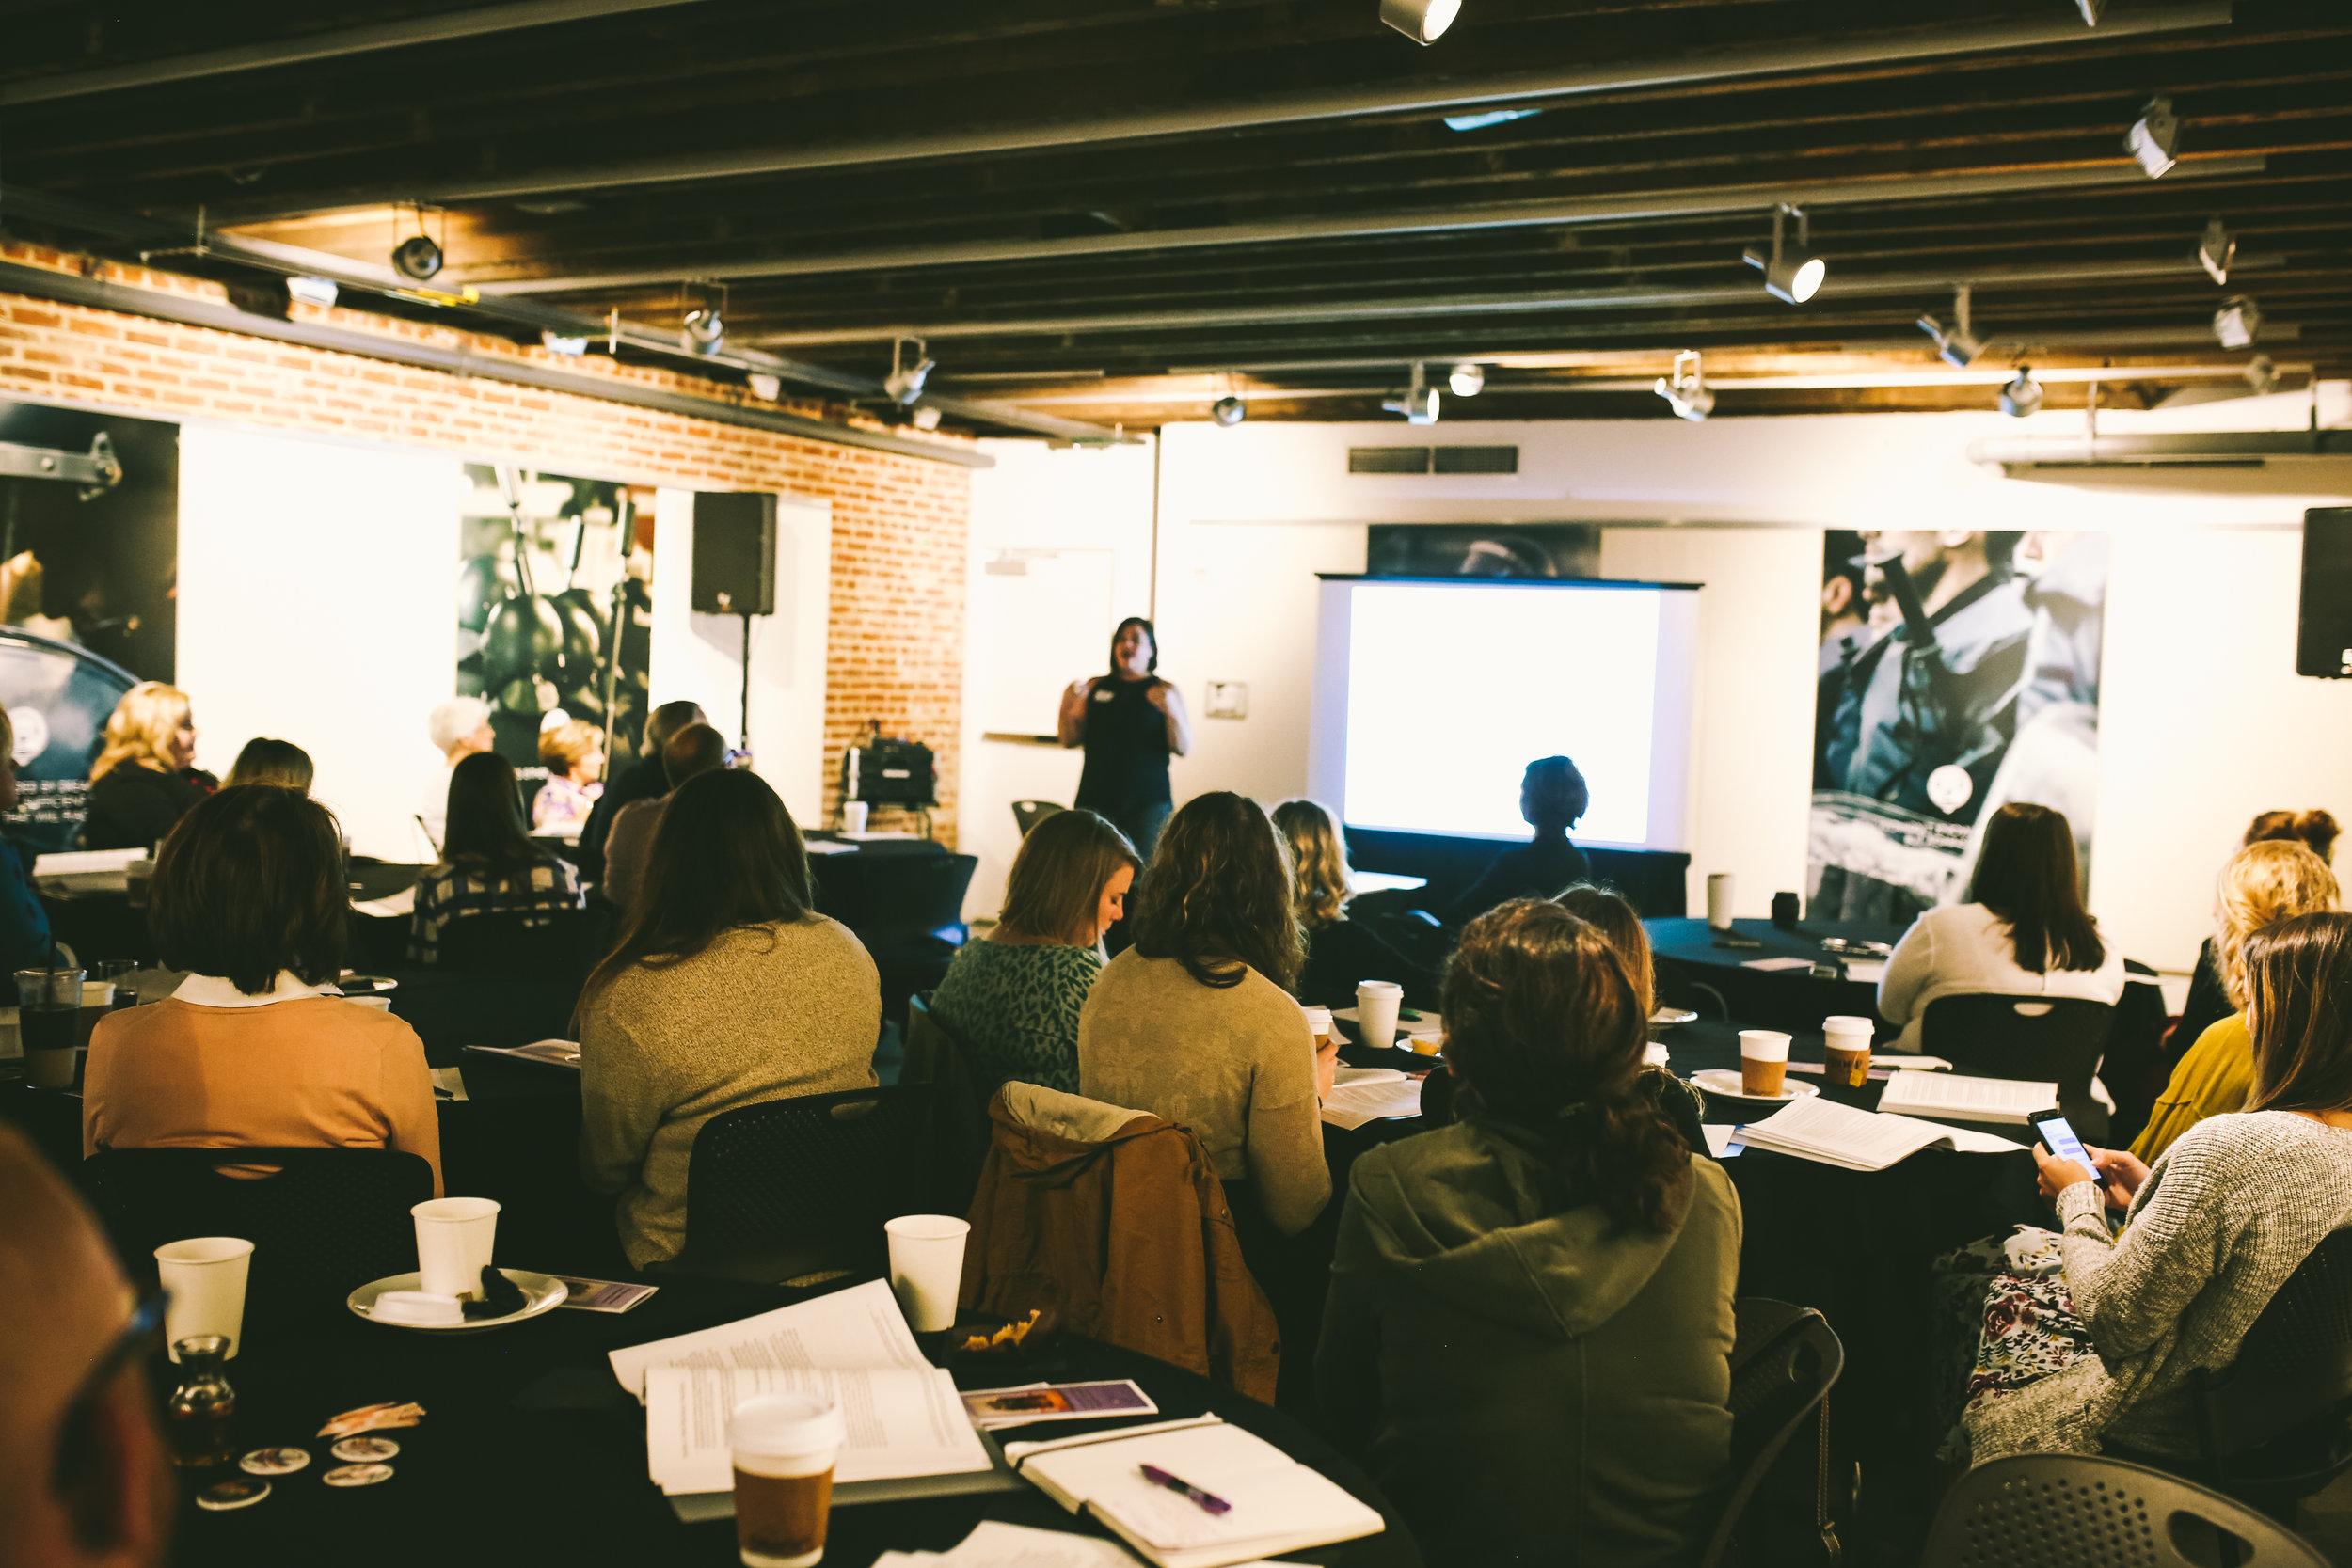 FEVA Seminar 21C 9-27-16 Crystal Ludwick Photo LLC (36 of 55).jpg